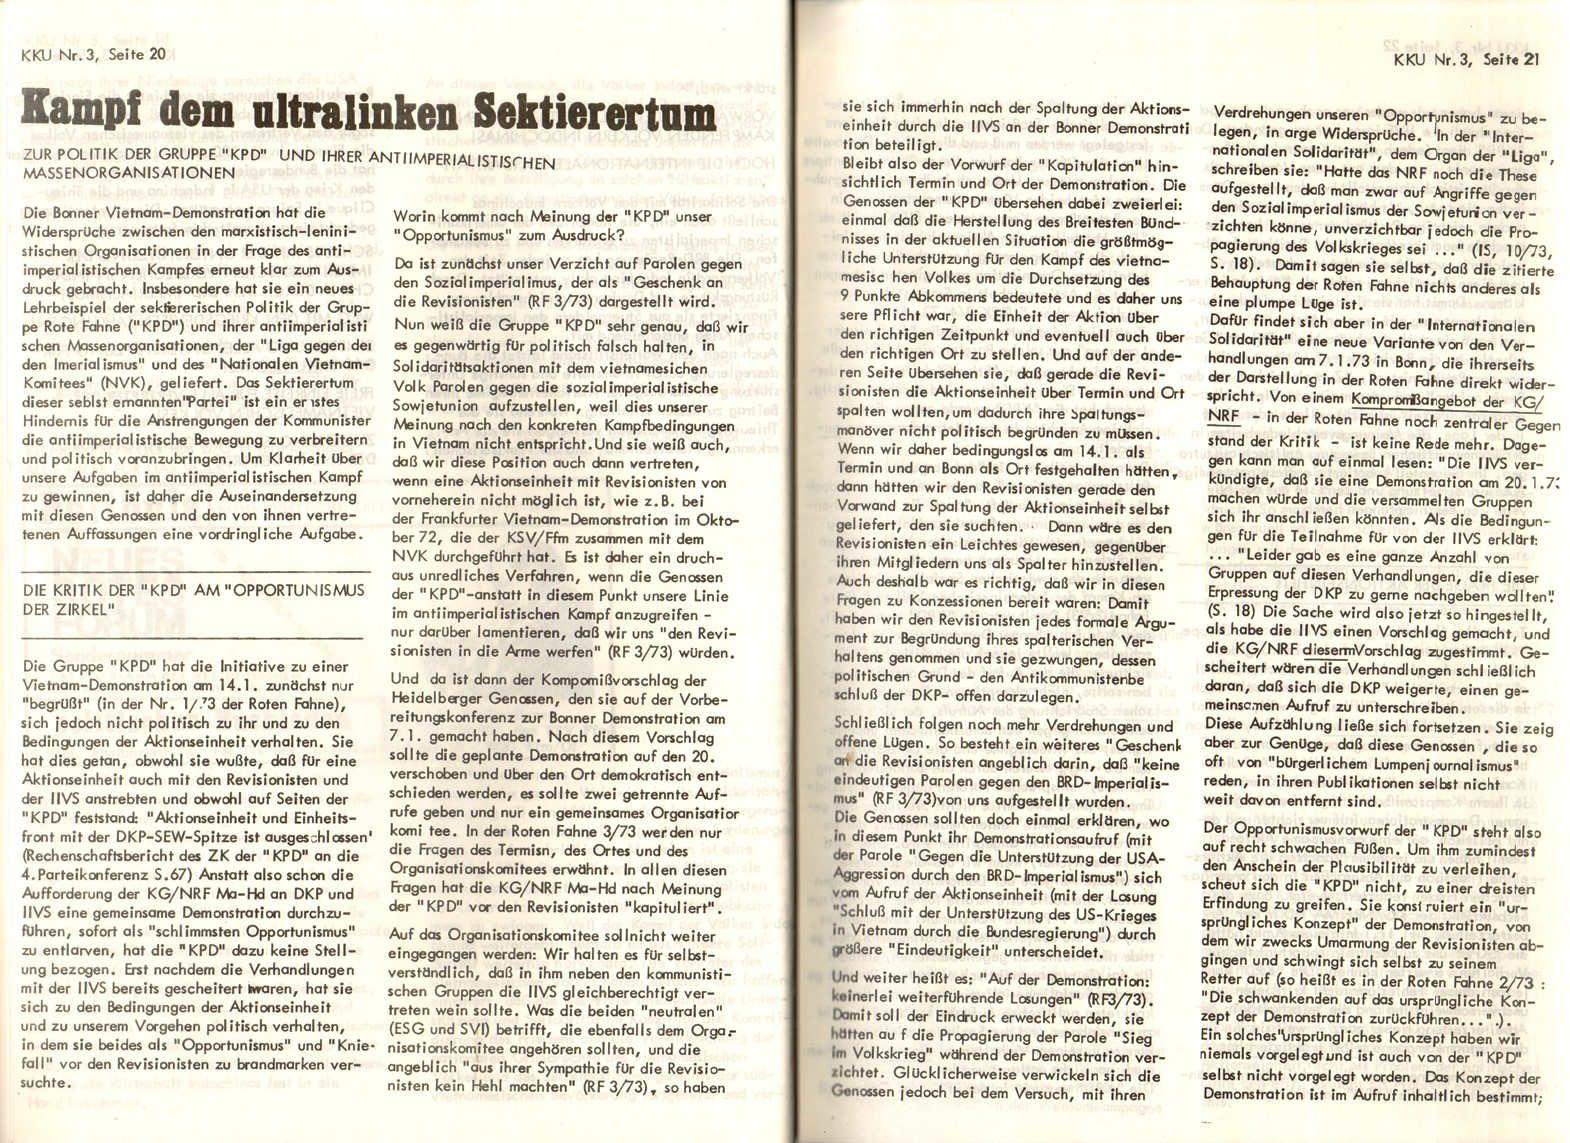 Frankfurt_Offenbach_KG_Kampf_Kritik_Umgestaltung_1973_03_12